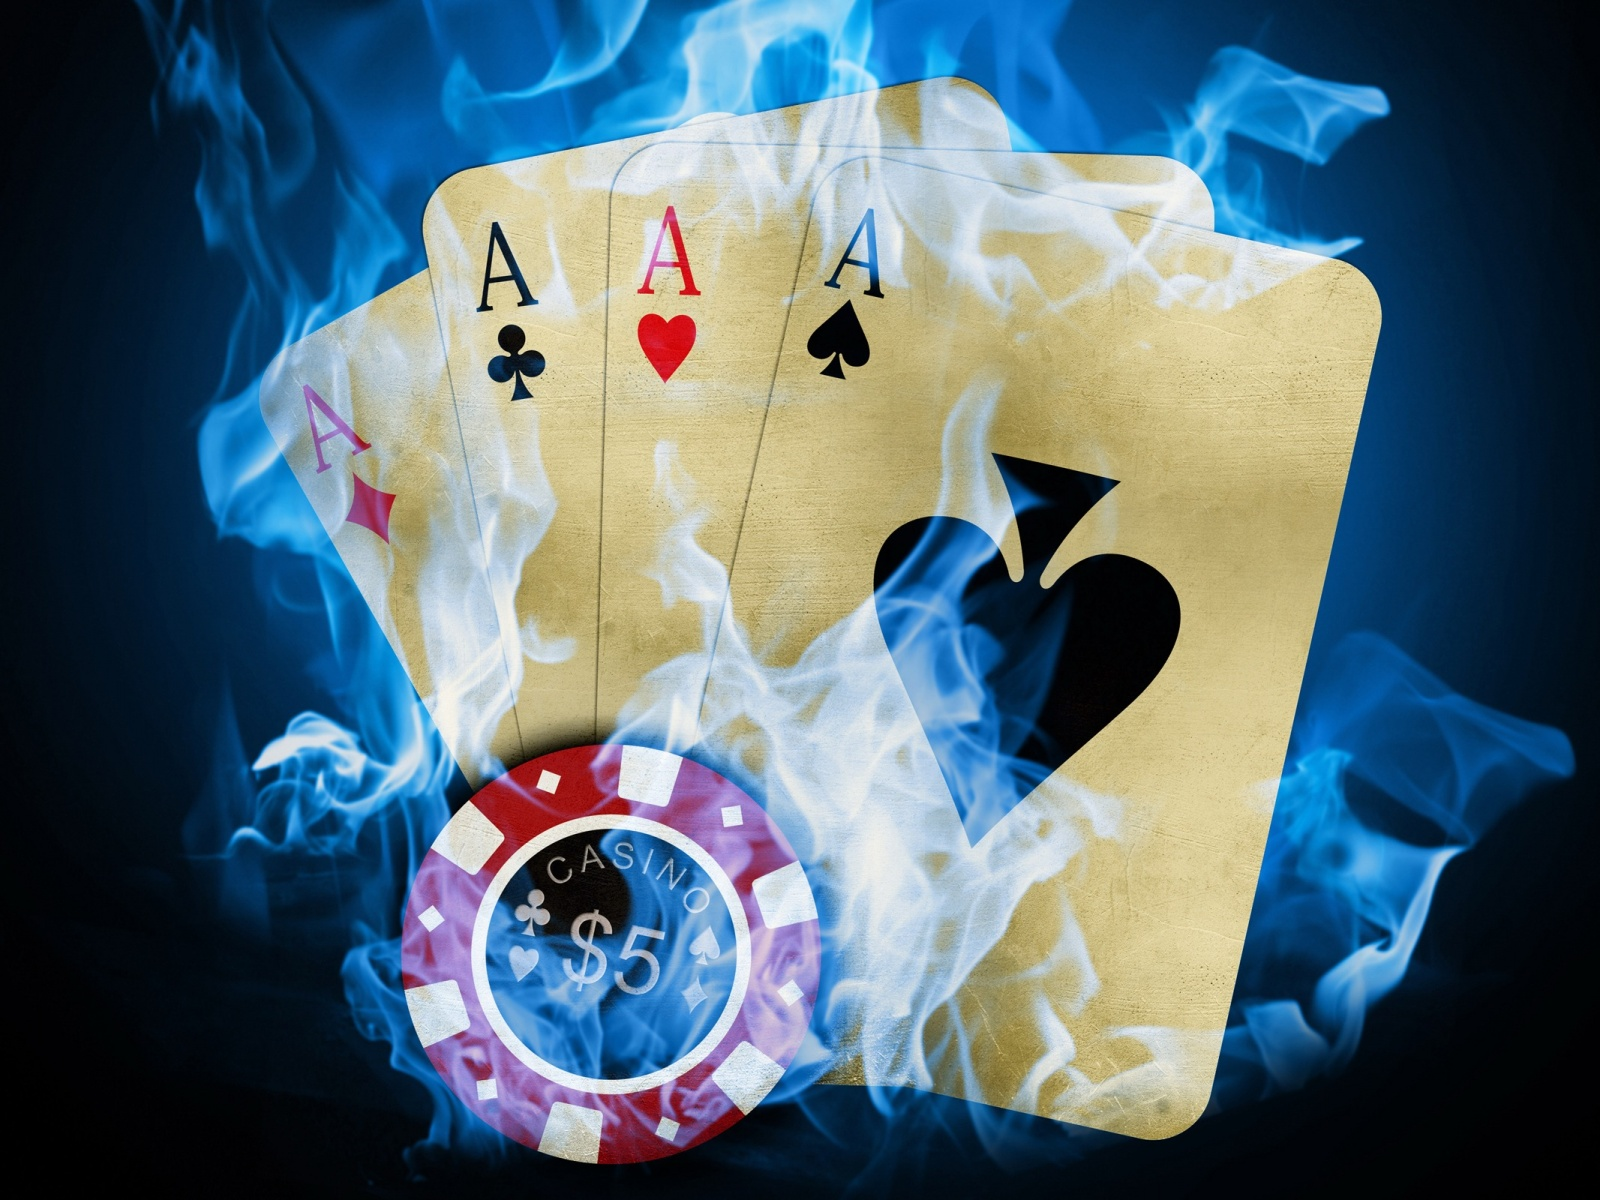 Casino Games Online - Gambling